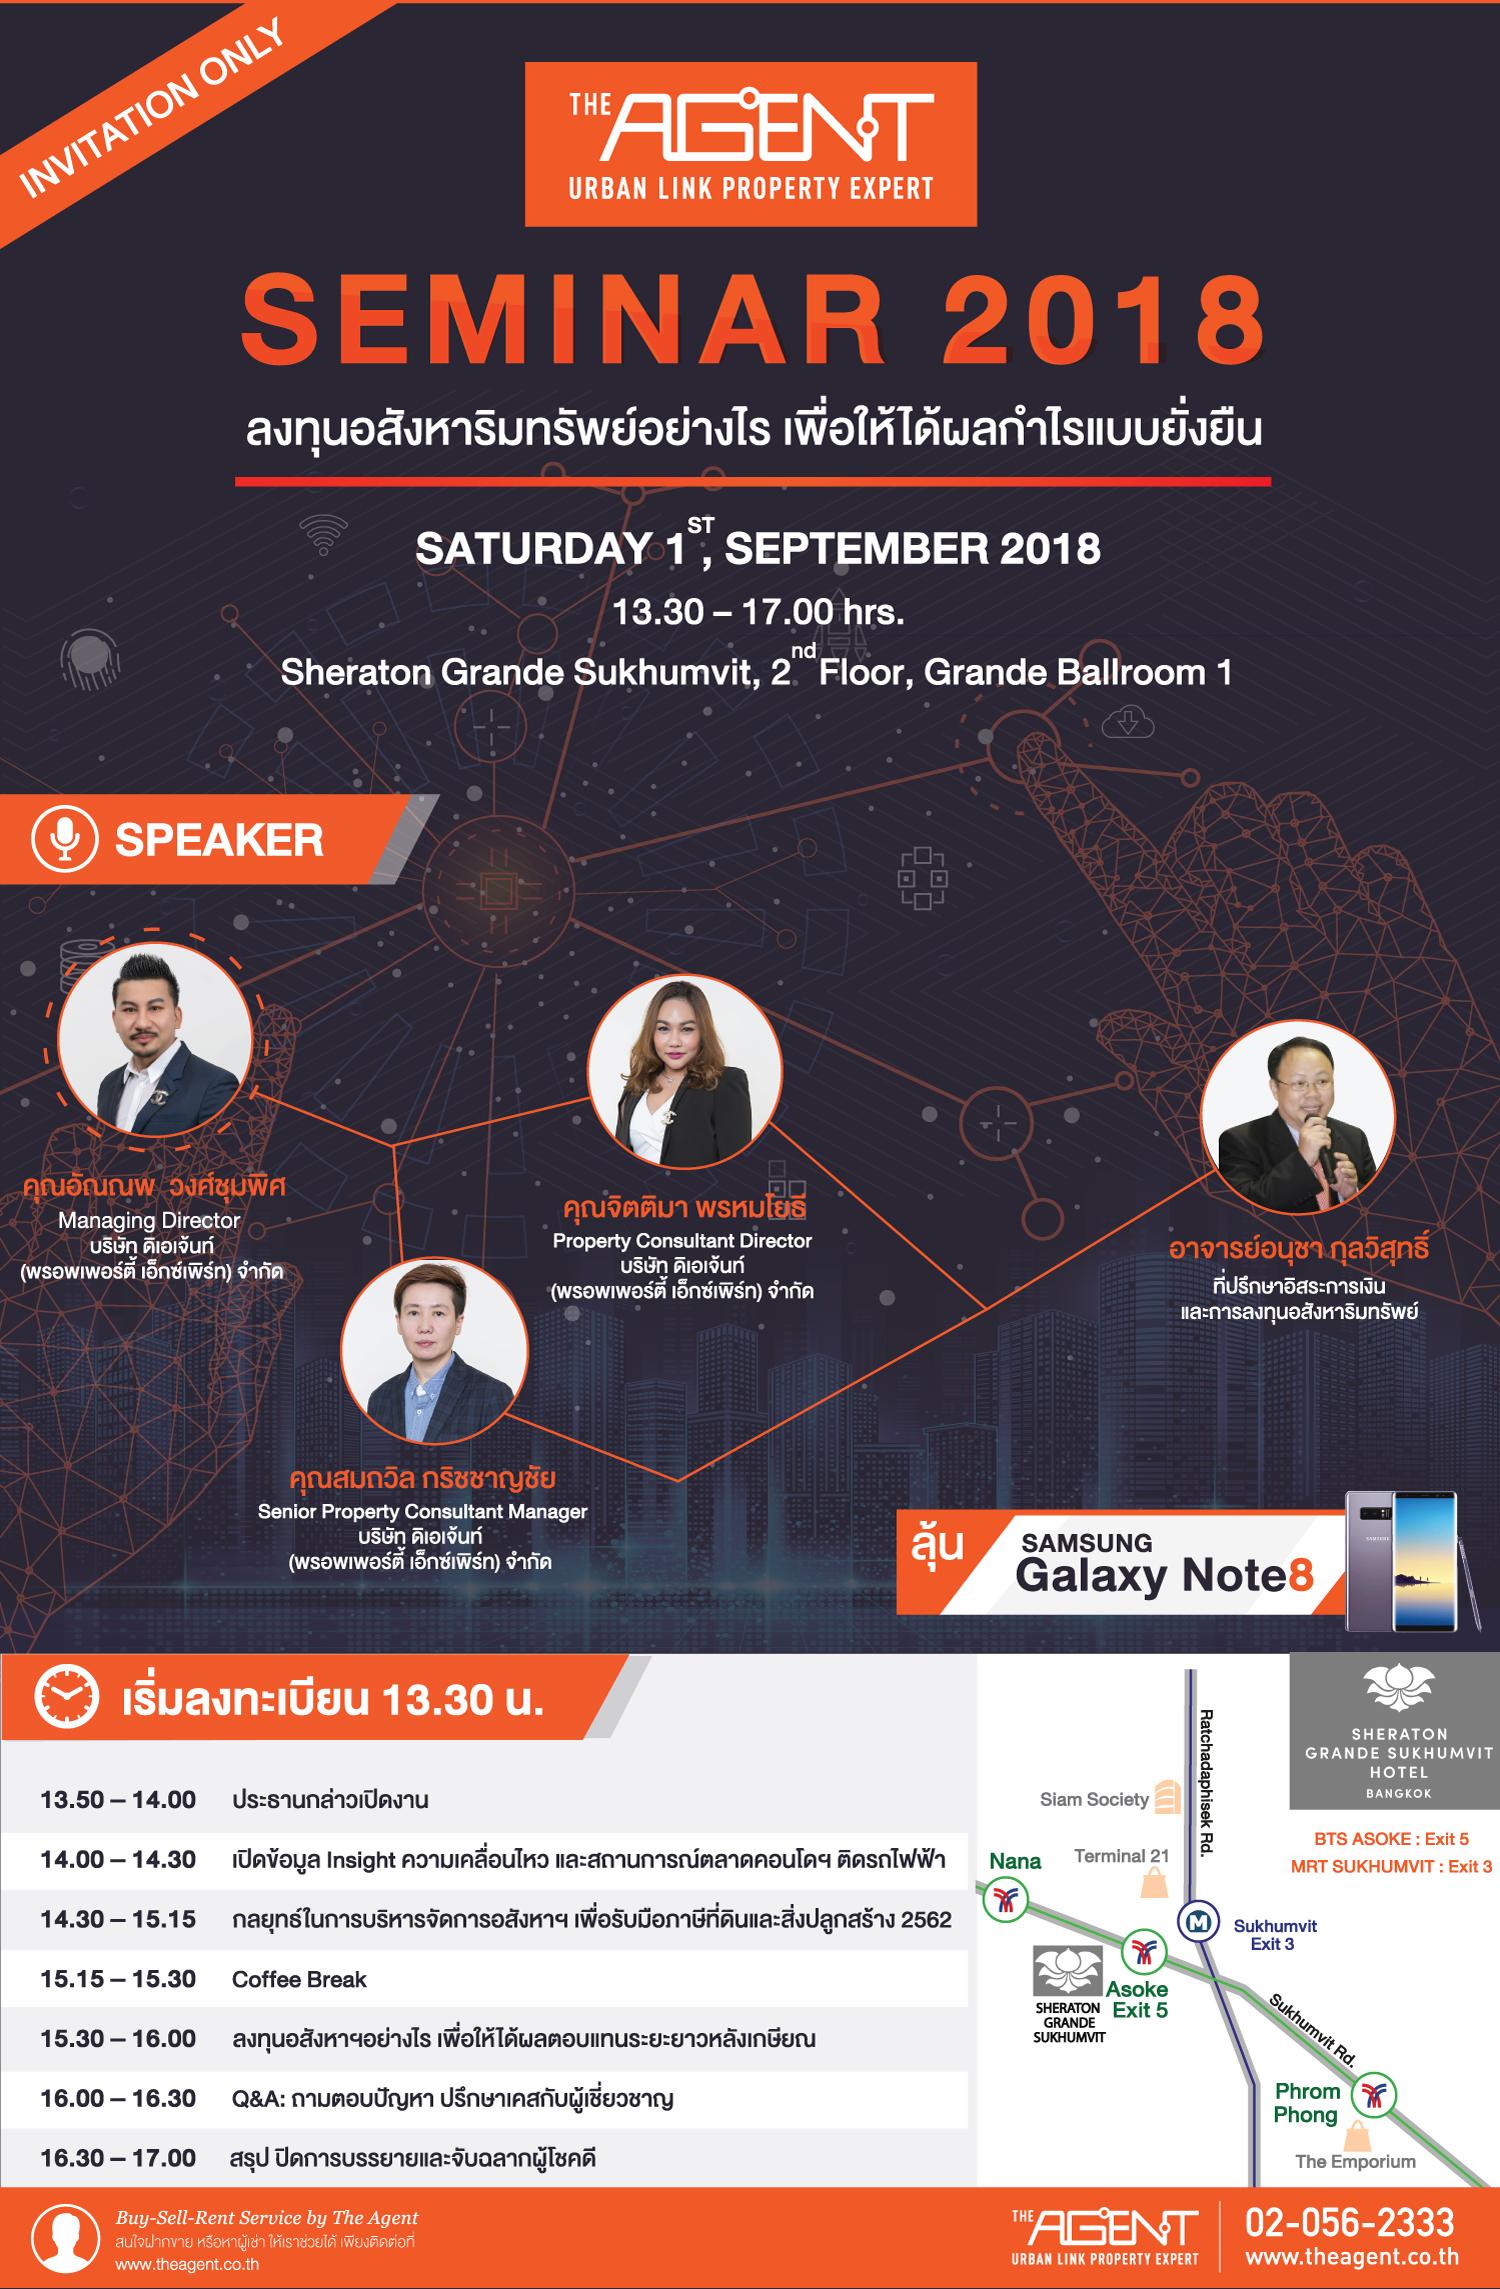 EDM-The-Agent-CRM-Seminar2018-CRE.JPG